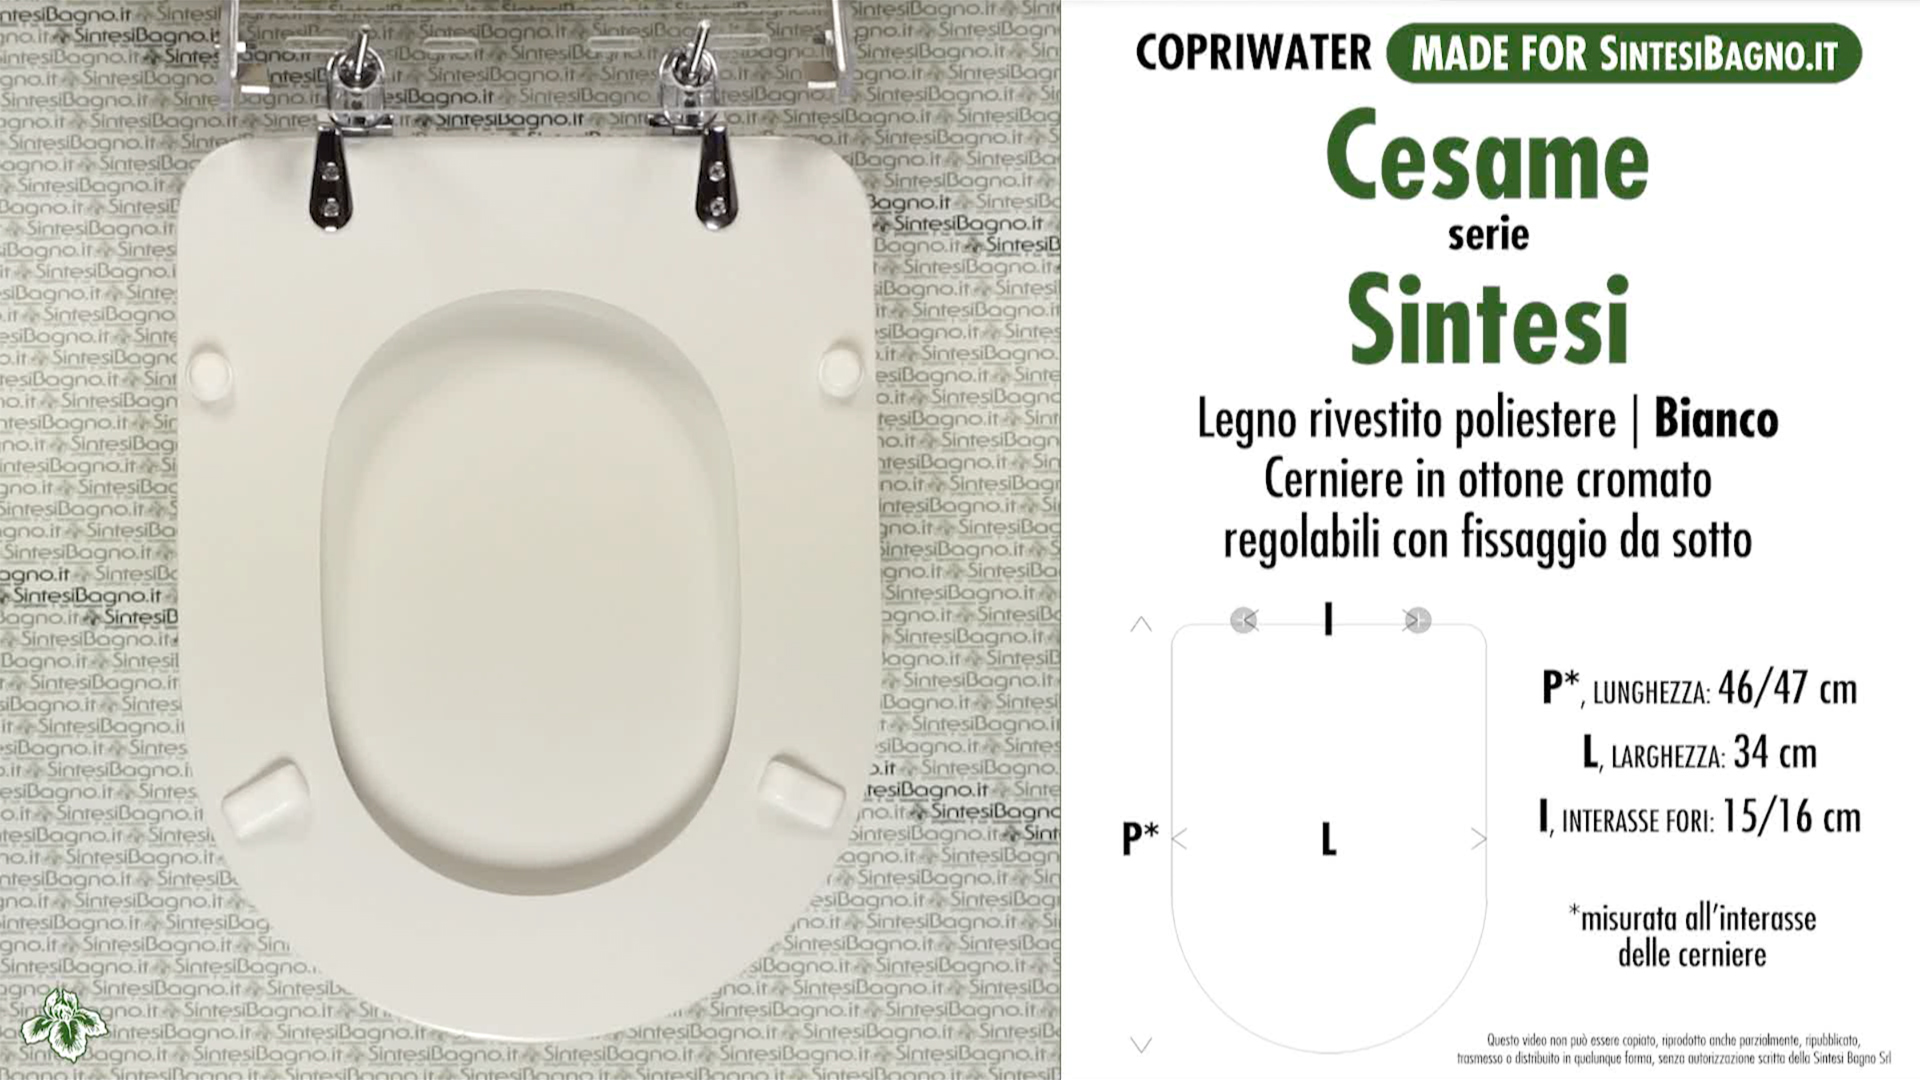 Details about Toilet Seat SintesiBagno MADE for Cesame WC SINTESI series.  DILSINSINTESI